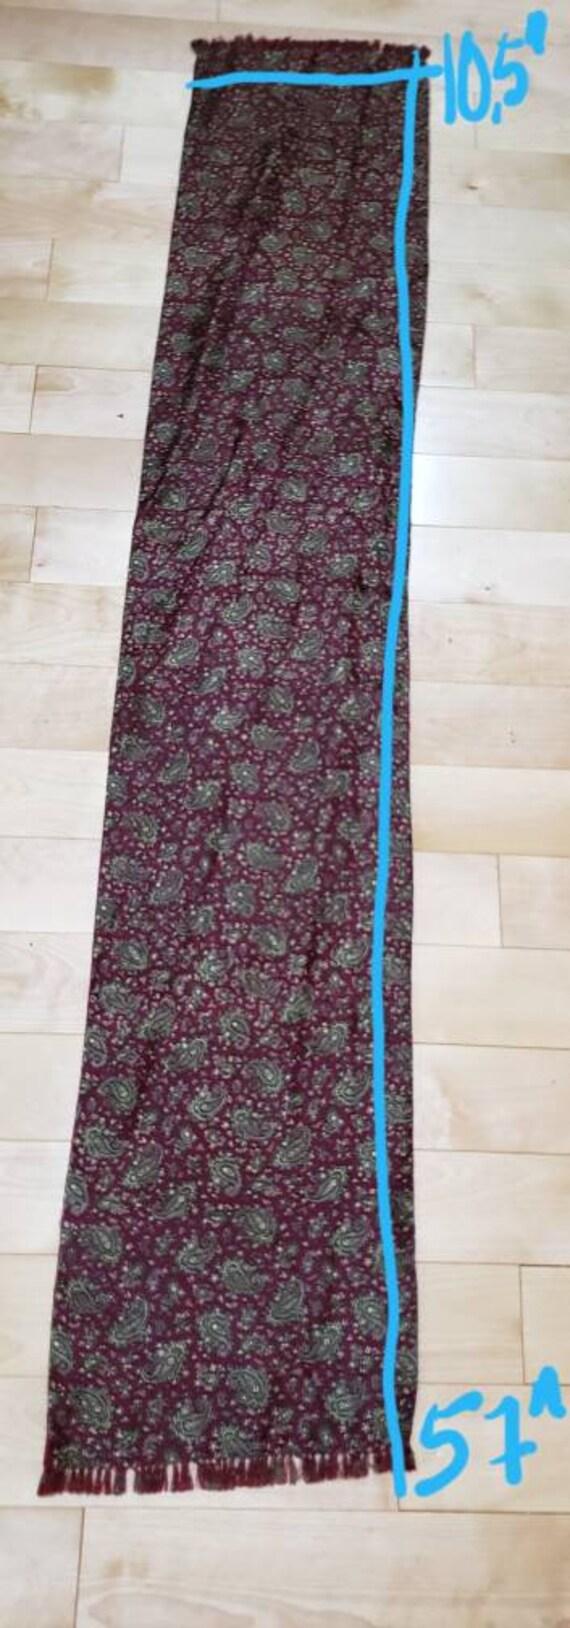 60s burgundy paisley print gentlemen scarf - image 7